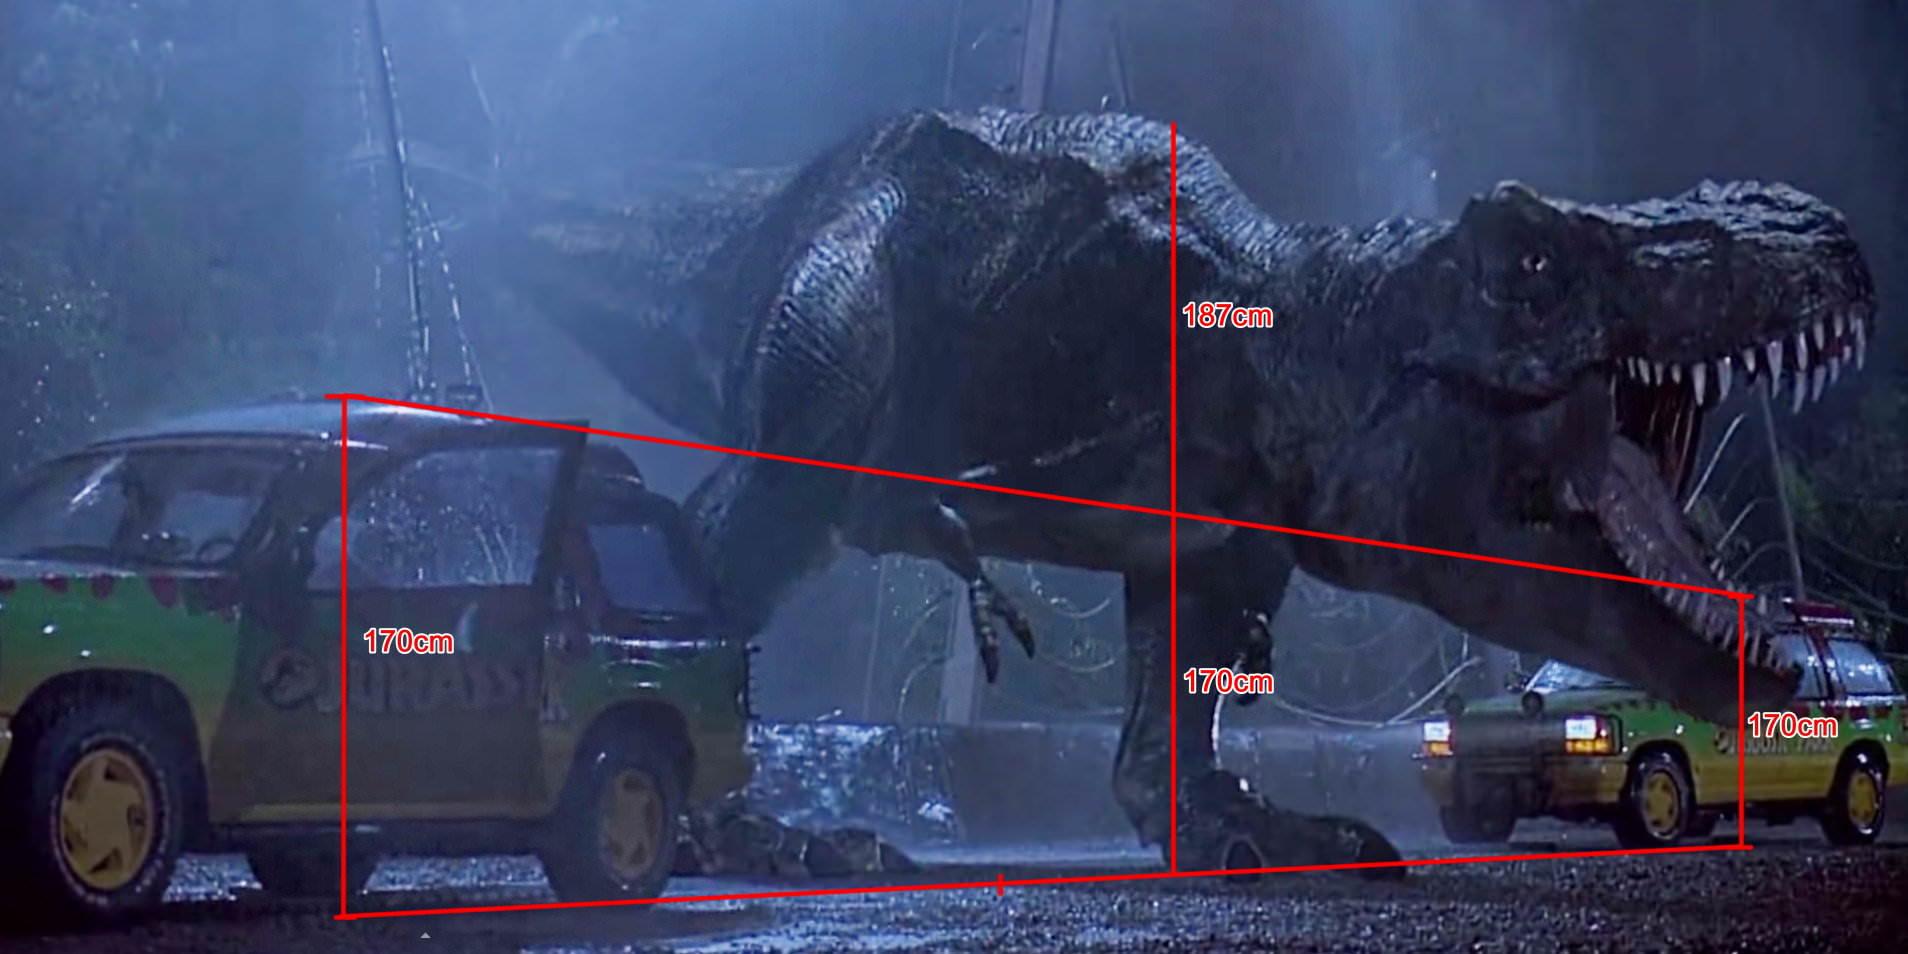 Movie, Jurassic World: Fallen Kingdom(美國) / 侏羅紀世界:殞落國度(台) / 侏罗纪世界2(中) / 侏羅紀世界:迷失國度(港), 科學考究